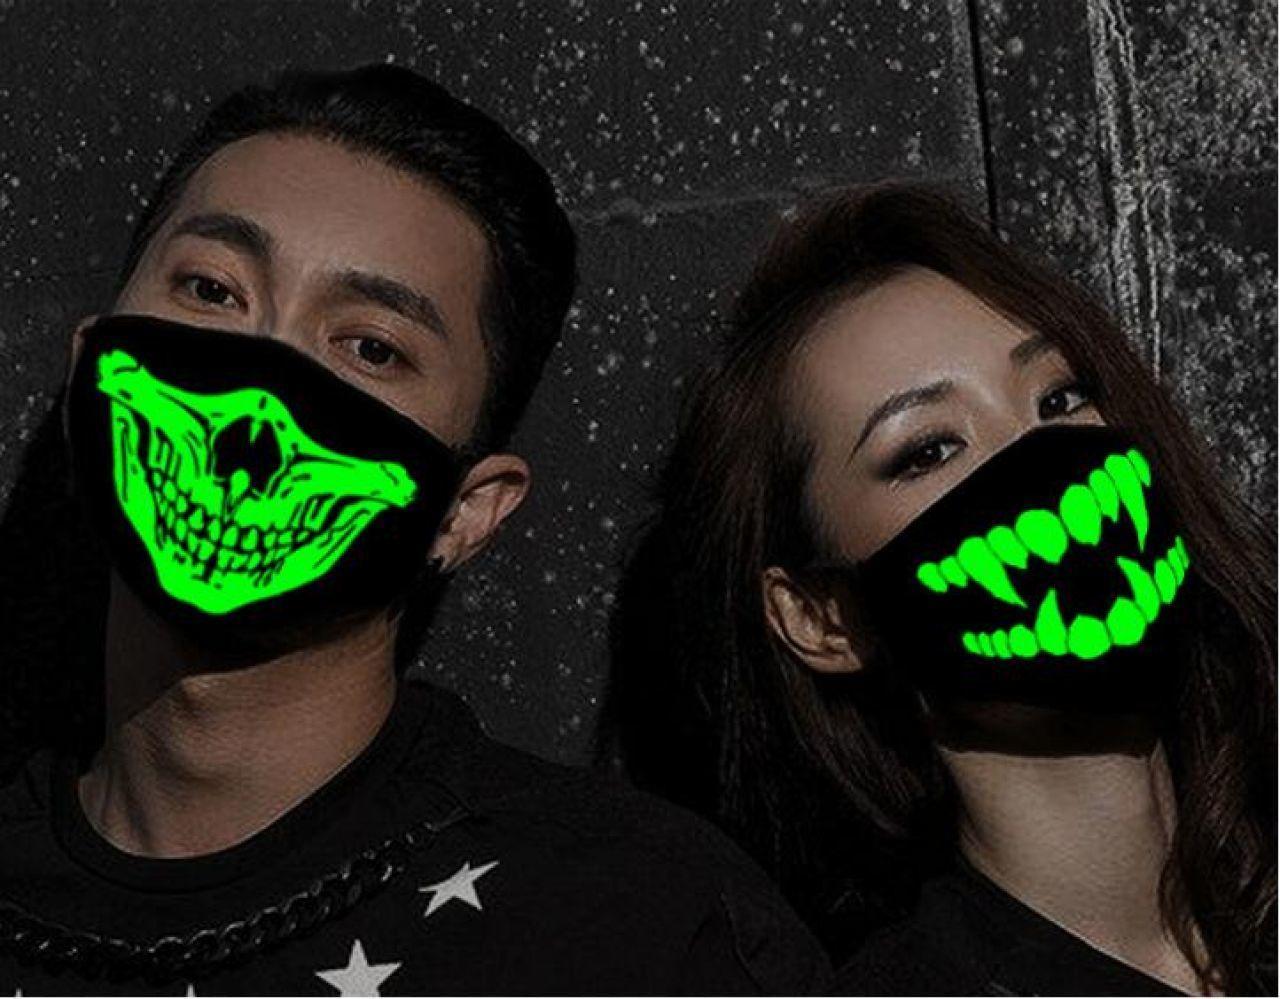 maschera nera bocca